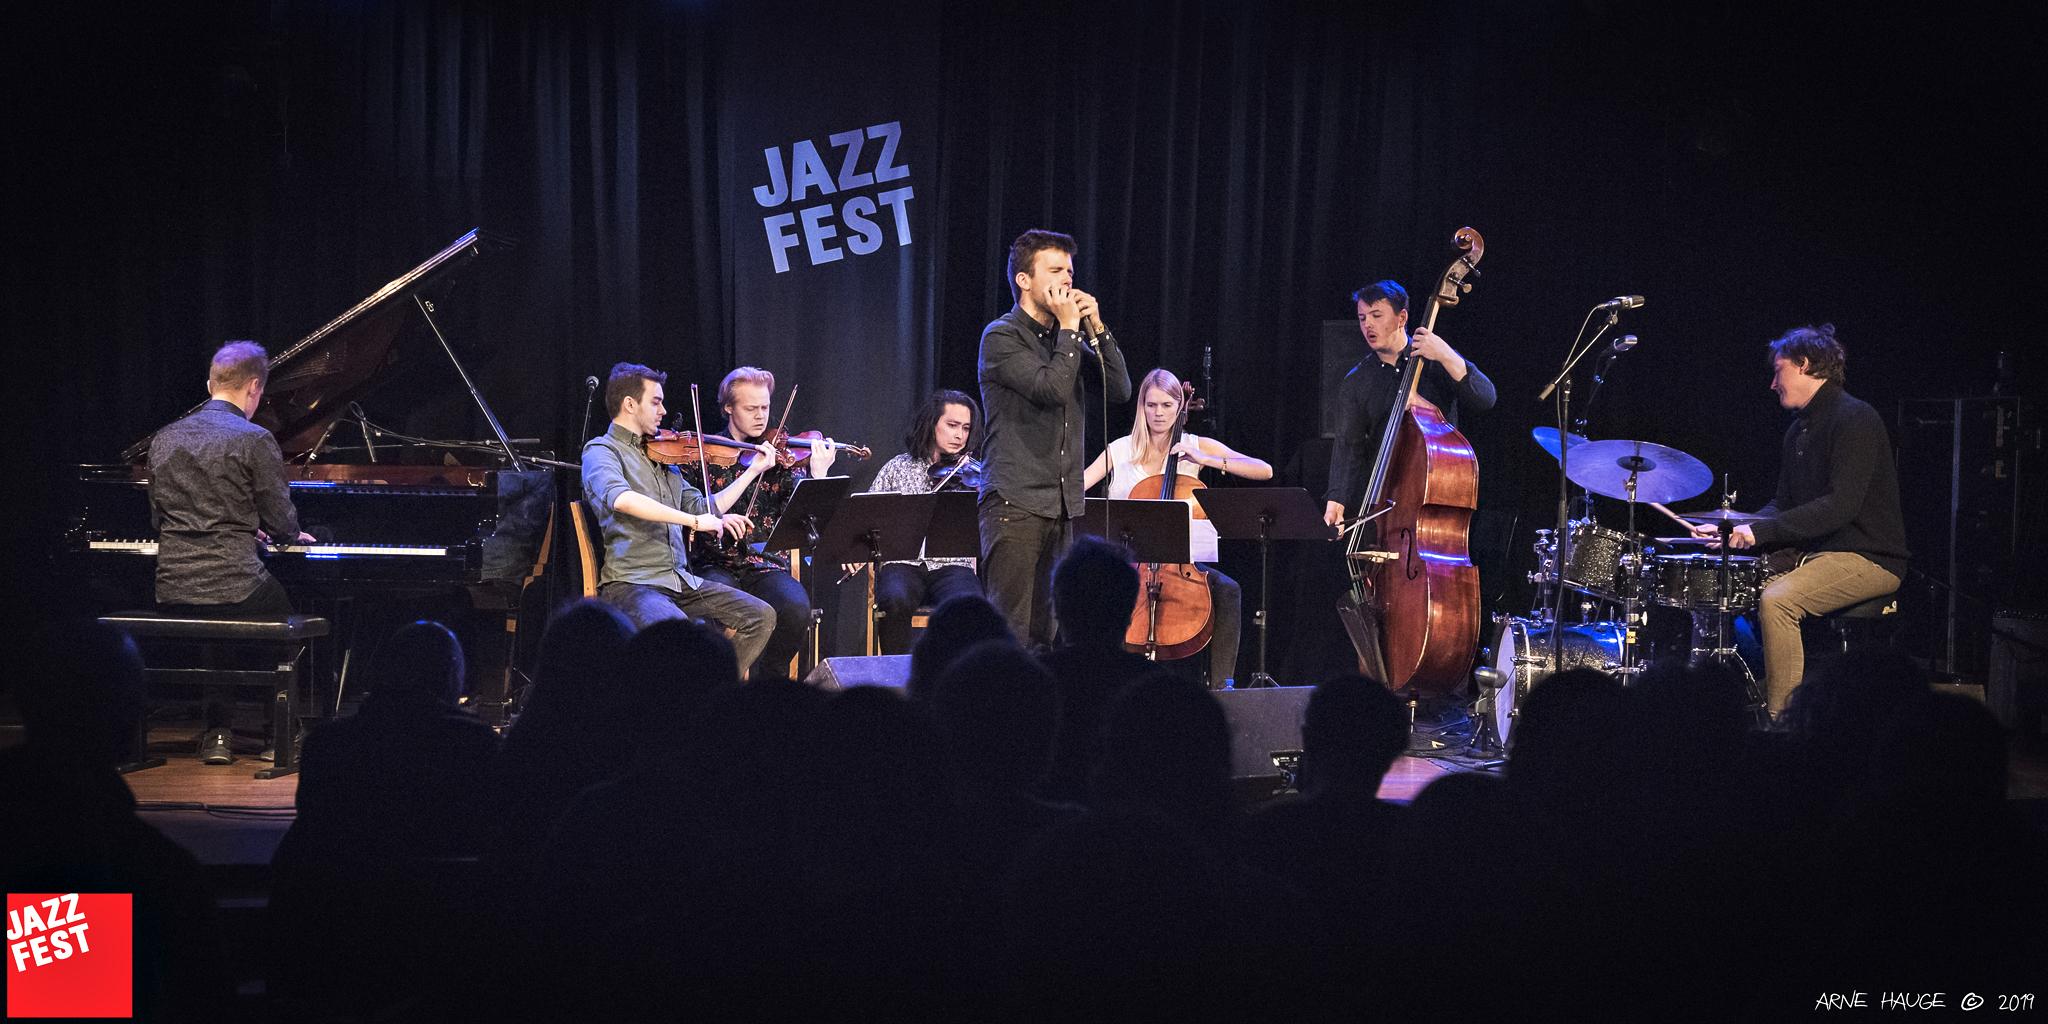 190510 Sondre Ferstad Ensemble (Jazz Expo) @ Dokkhuset - foto Arne Hauge_009.jpg